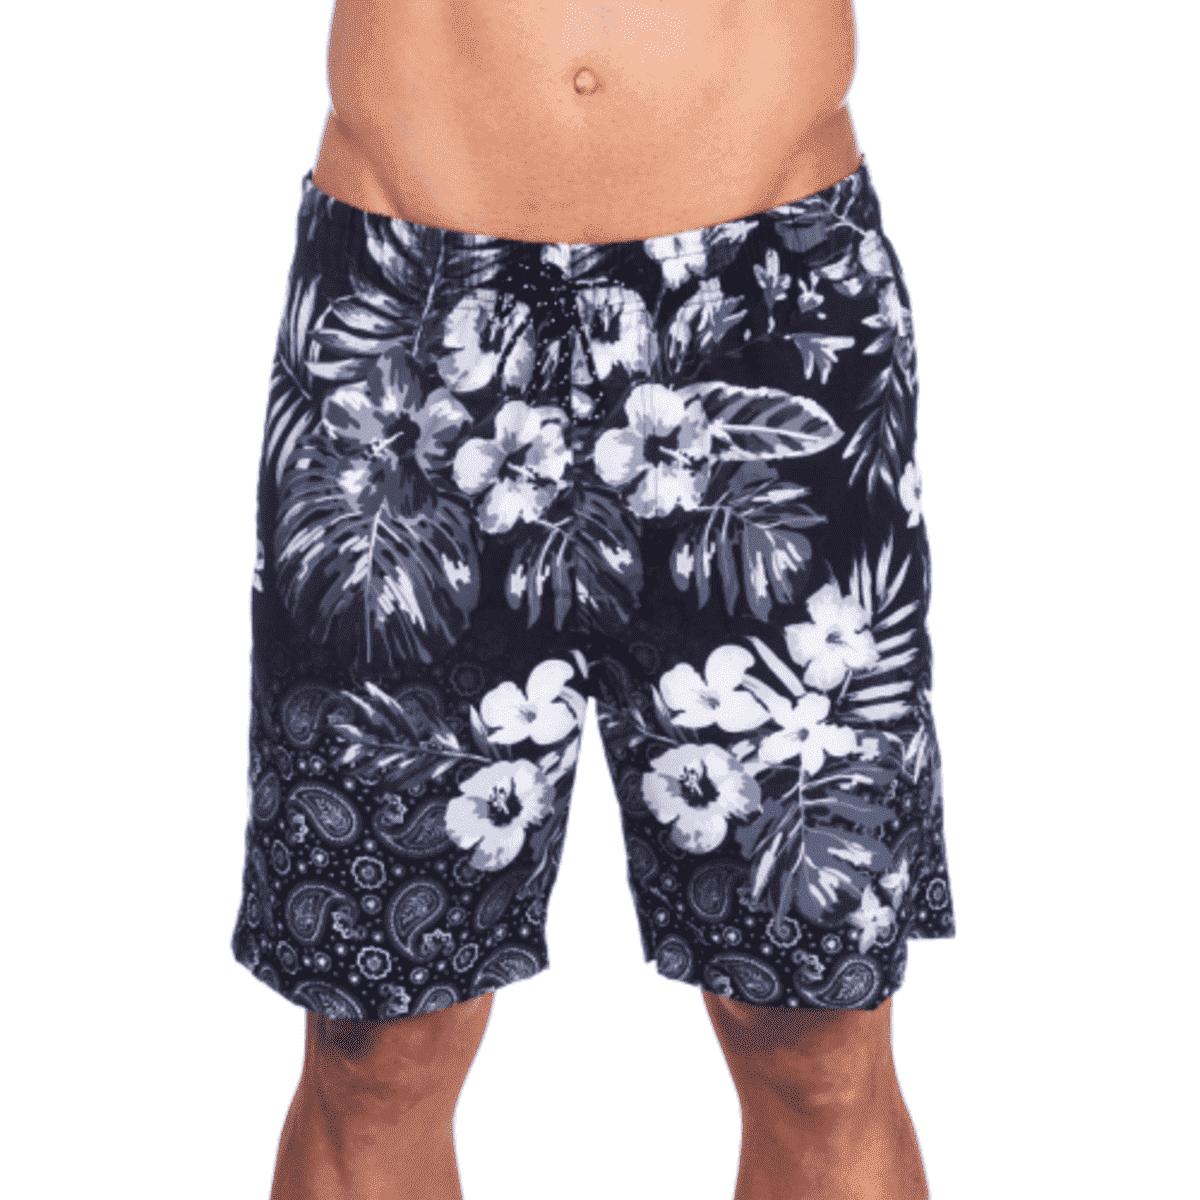 Kit 4 Short Bermuda Moletom Masculina Florida Floral Atacado